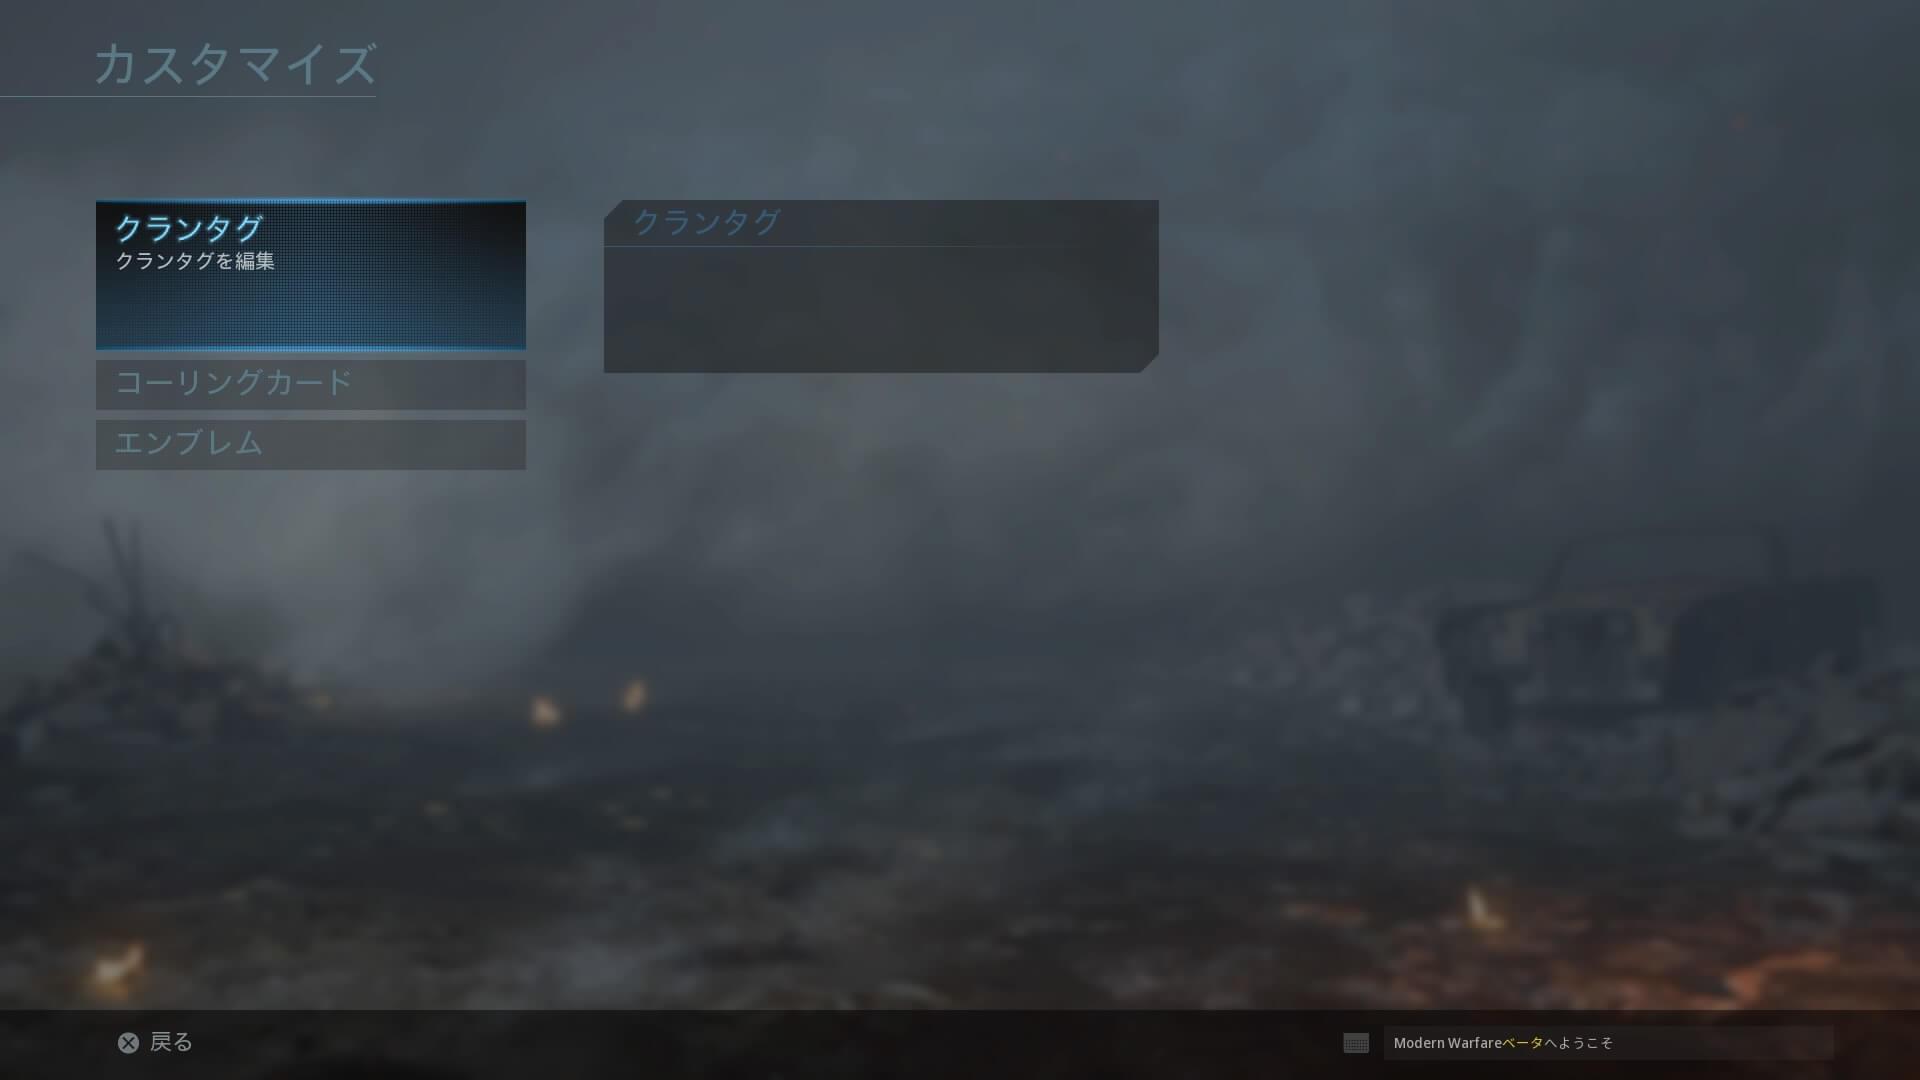 Call of Duty: Modern Warfare - Open Beta